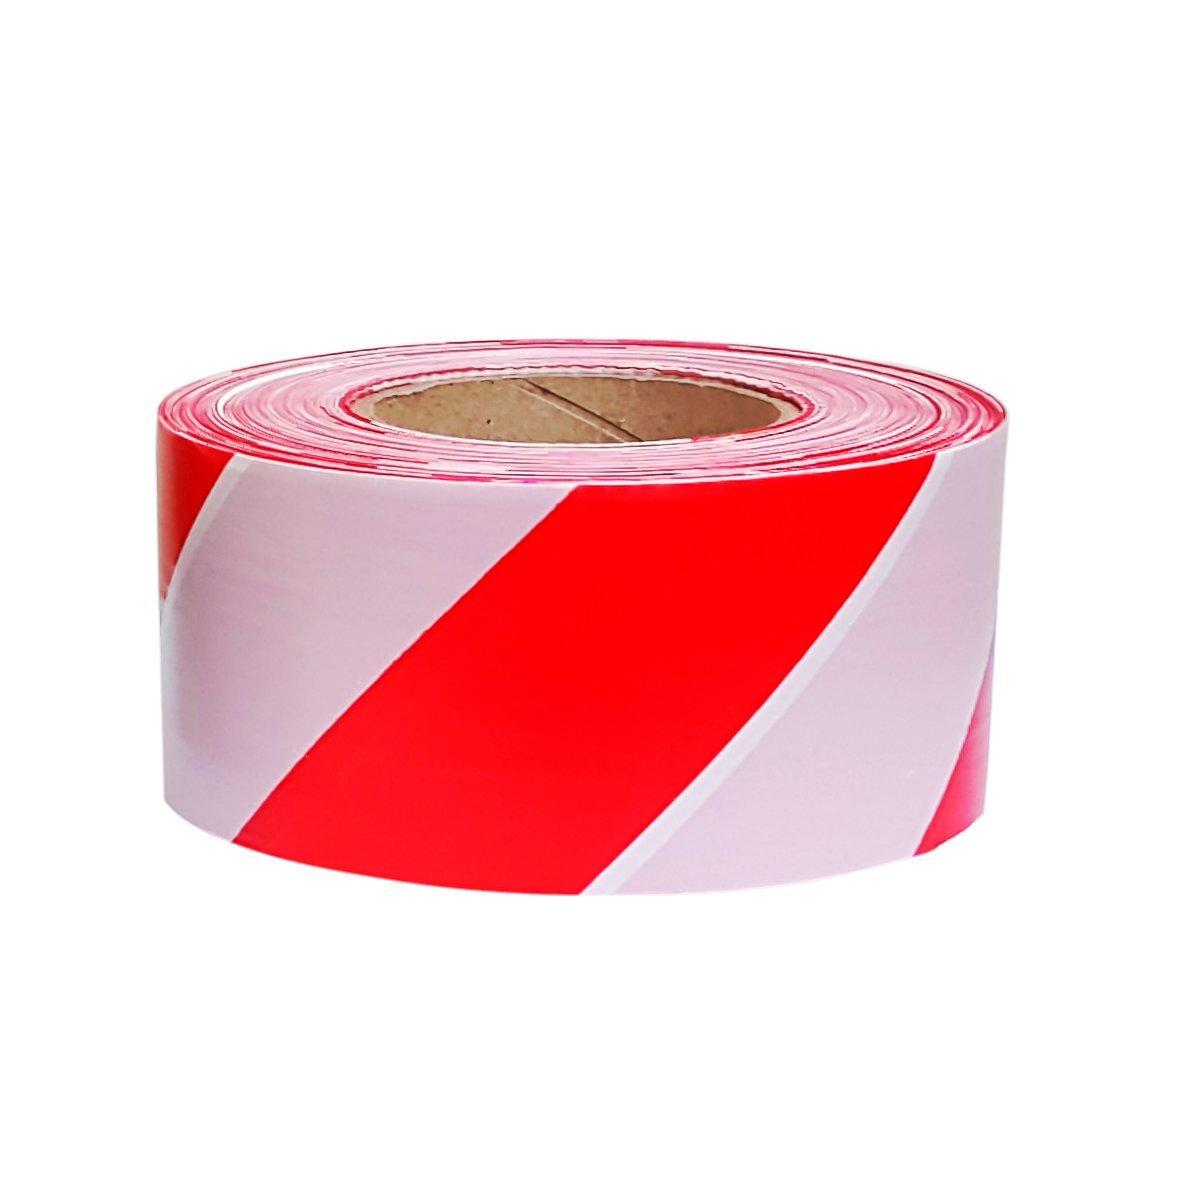 2 x Professional Barrier Hazard Safety Warning Tape Red /& White 70mm x 500m